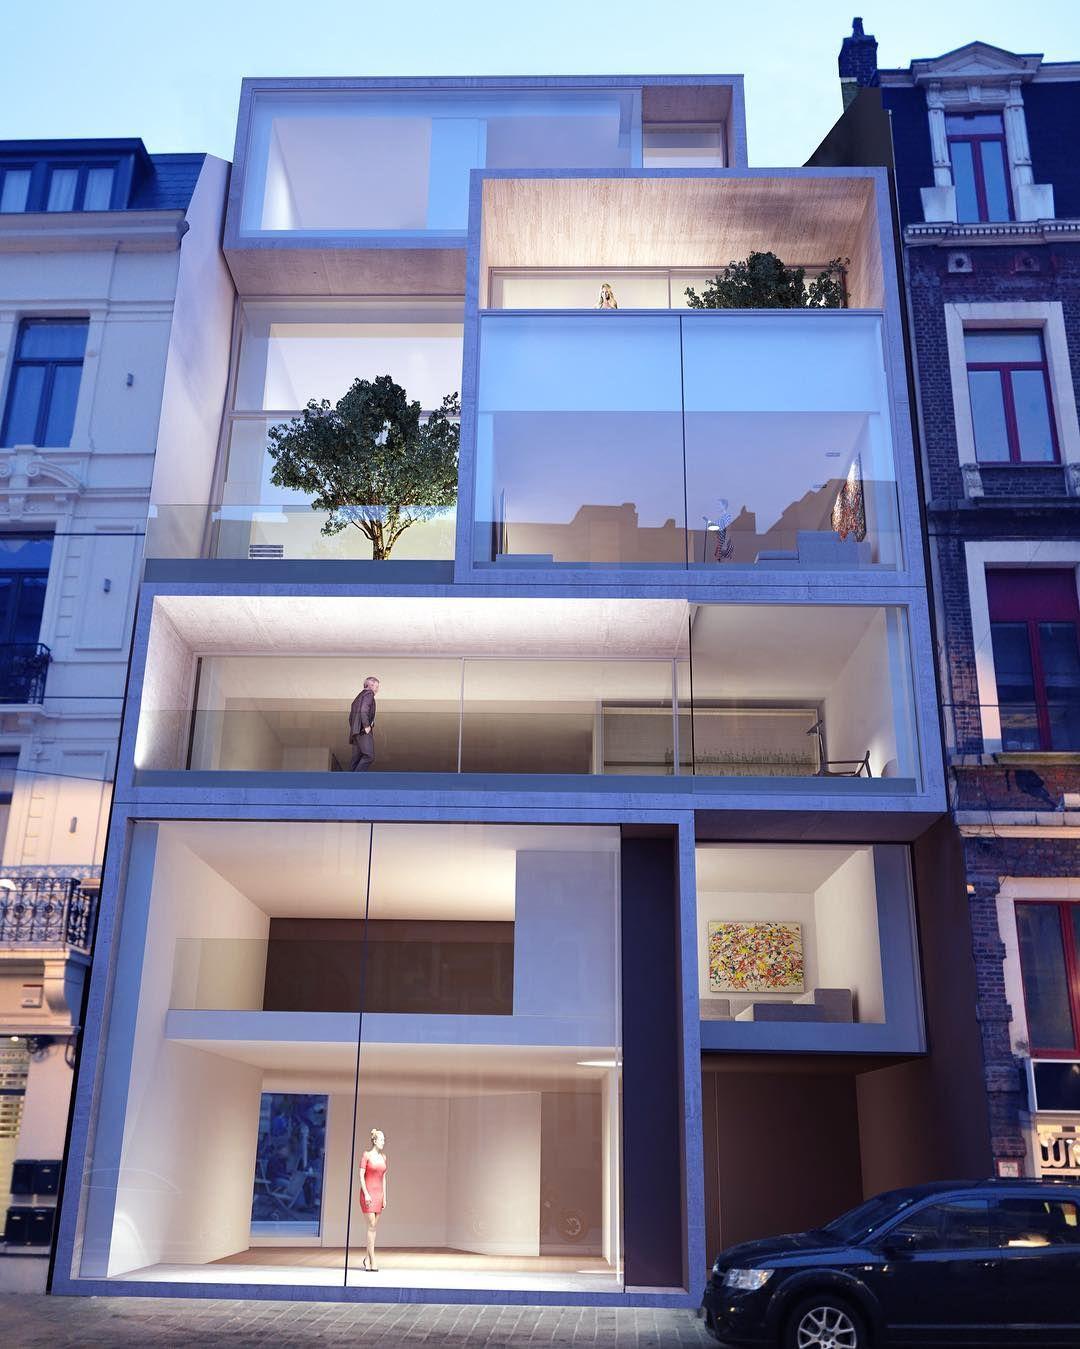 Small Luxury Apartment Buildings: Apartamentos De Luxo, Arquitetura, Casas